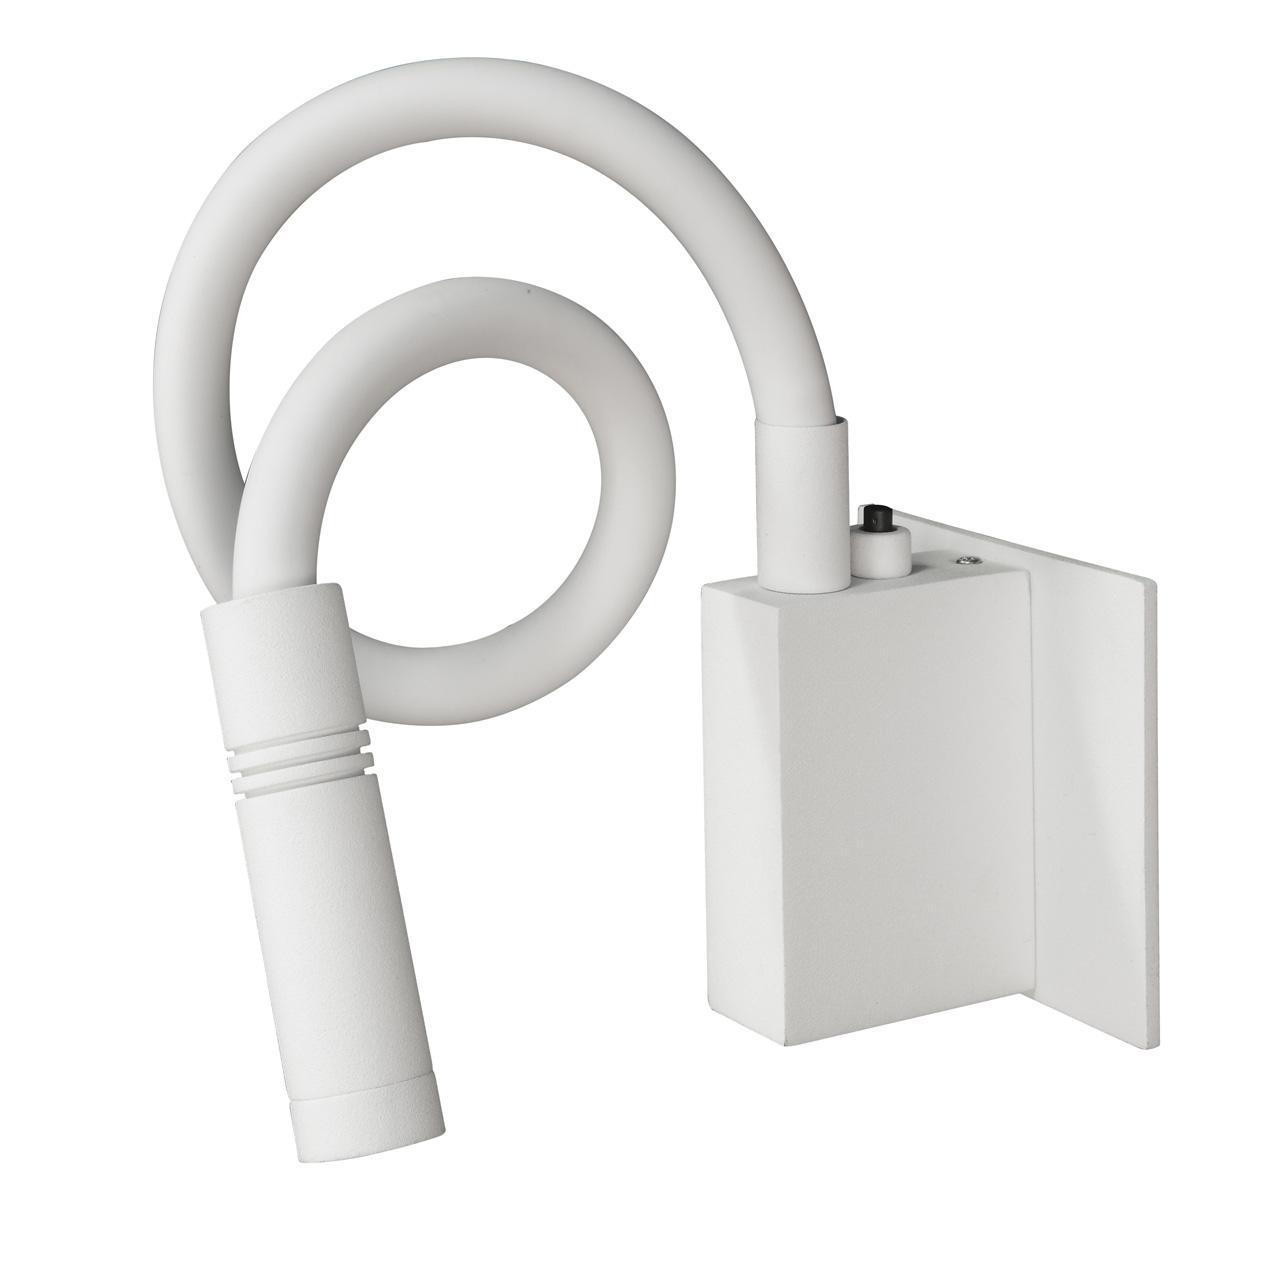 Светильник Lightstar 808616, белый portable digital monitor car volt voltmeter tester lcd cigarette lighter voltage panel meter